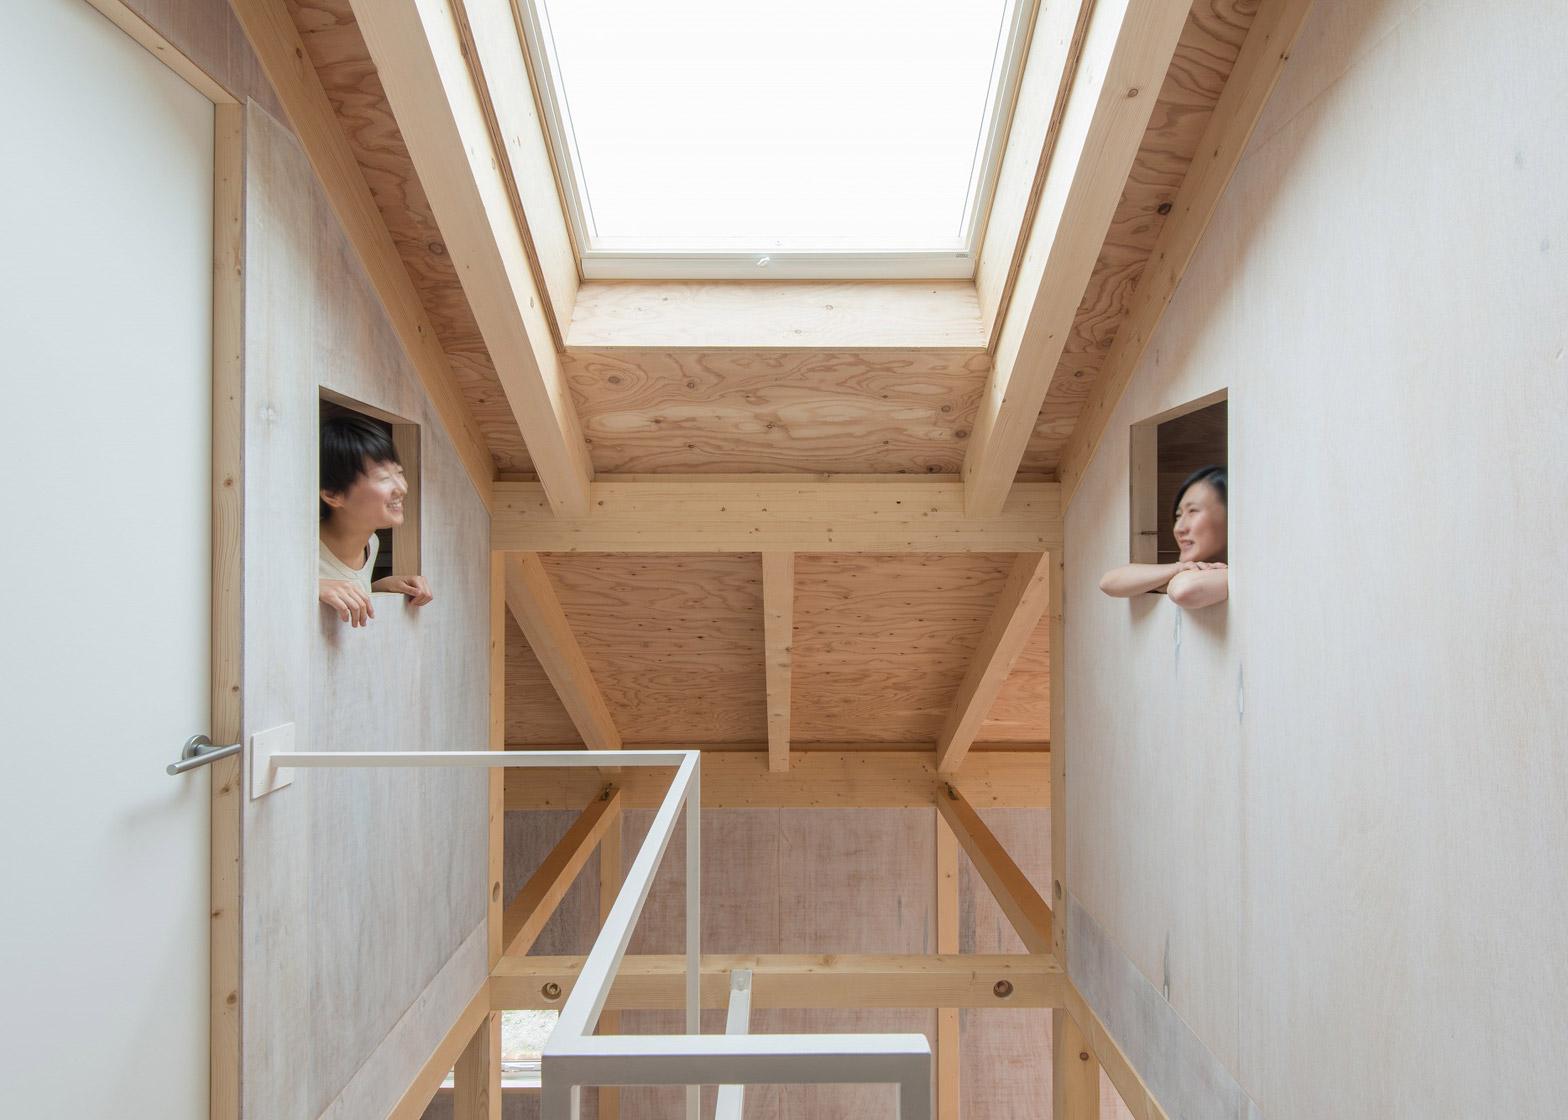 Timber Framed Home By Yoshichika Takagi Has Attic Bedroom